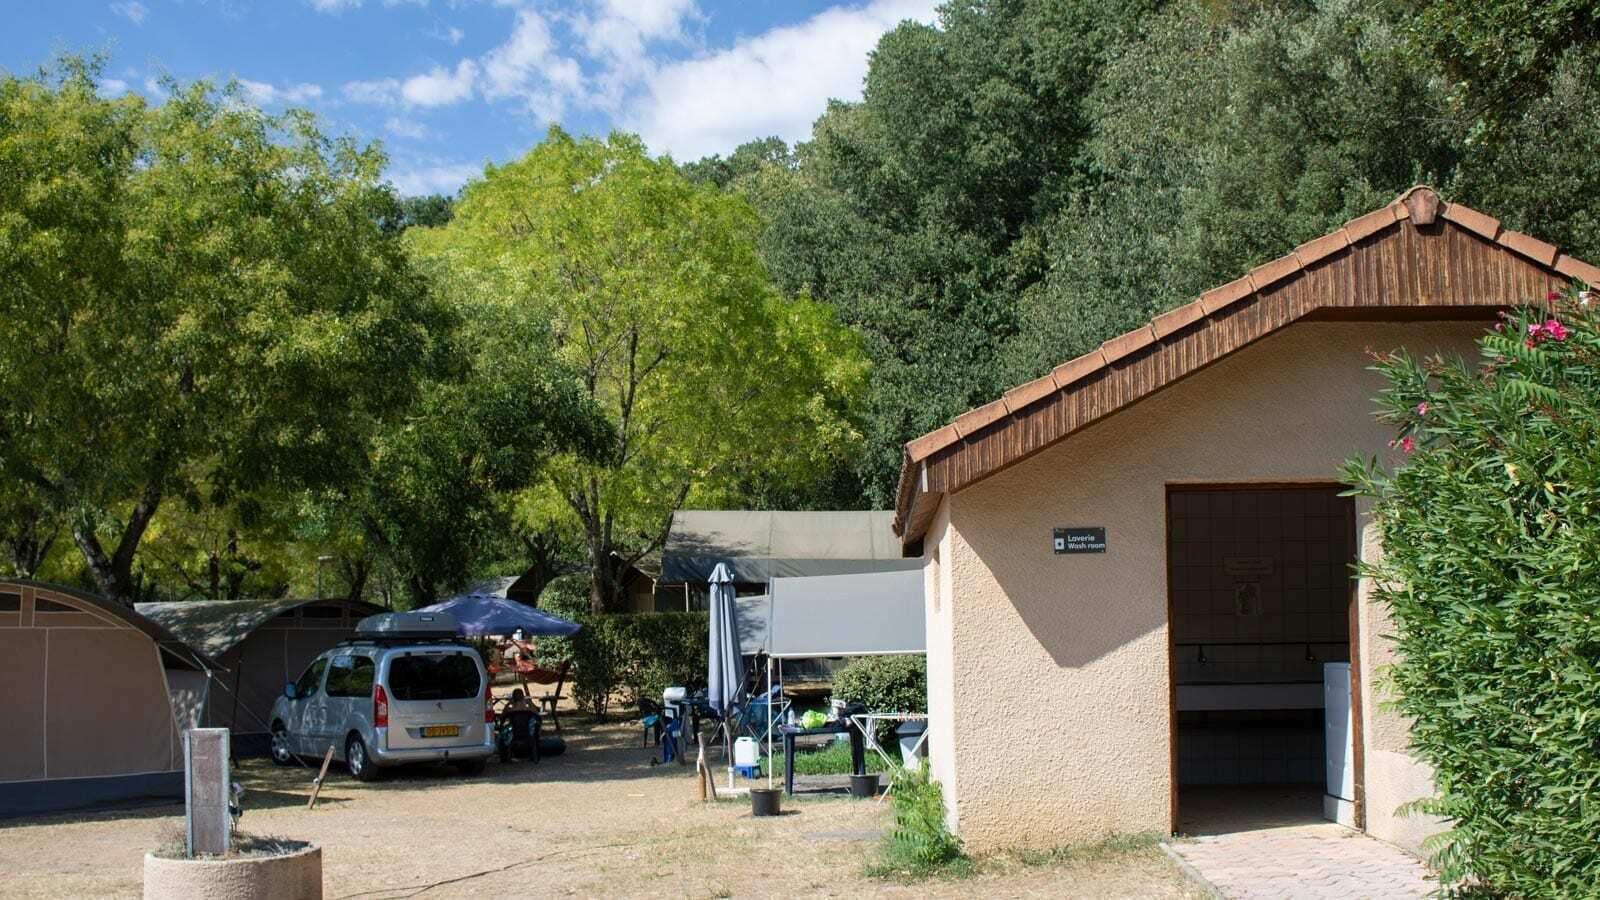 La Garenne | Luxe Sanitair XL 6 Pers.